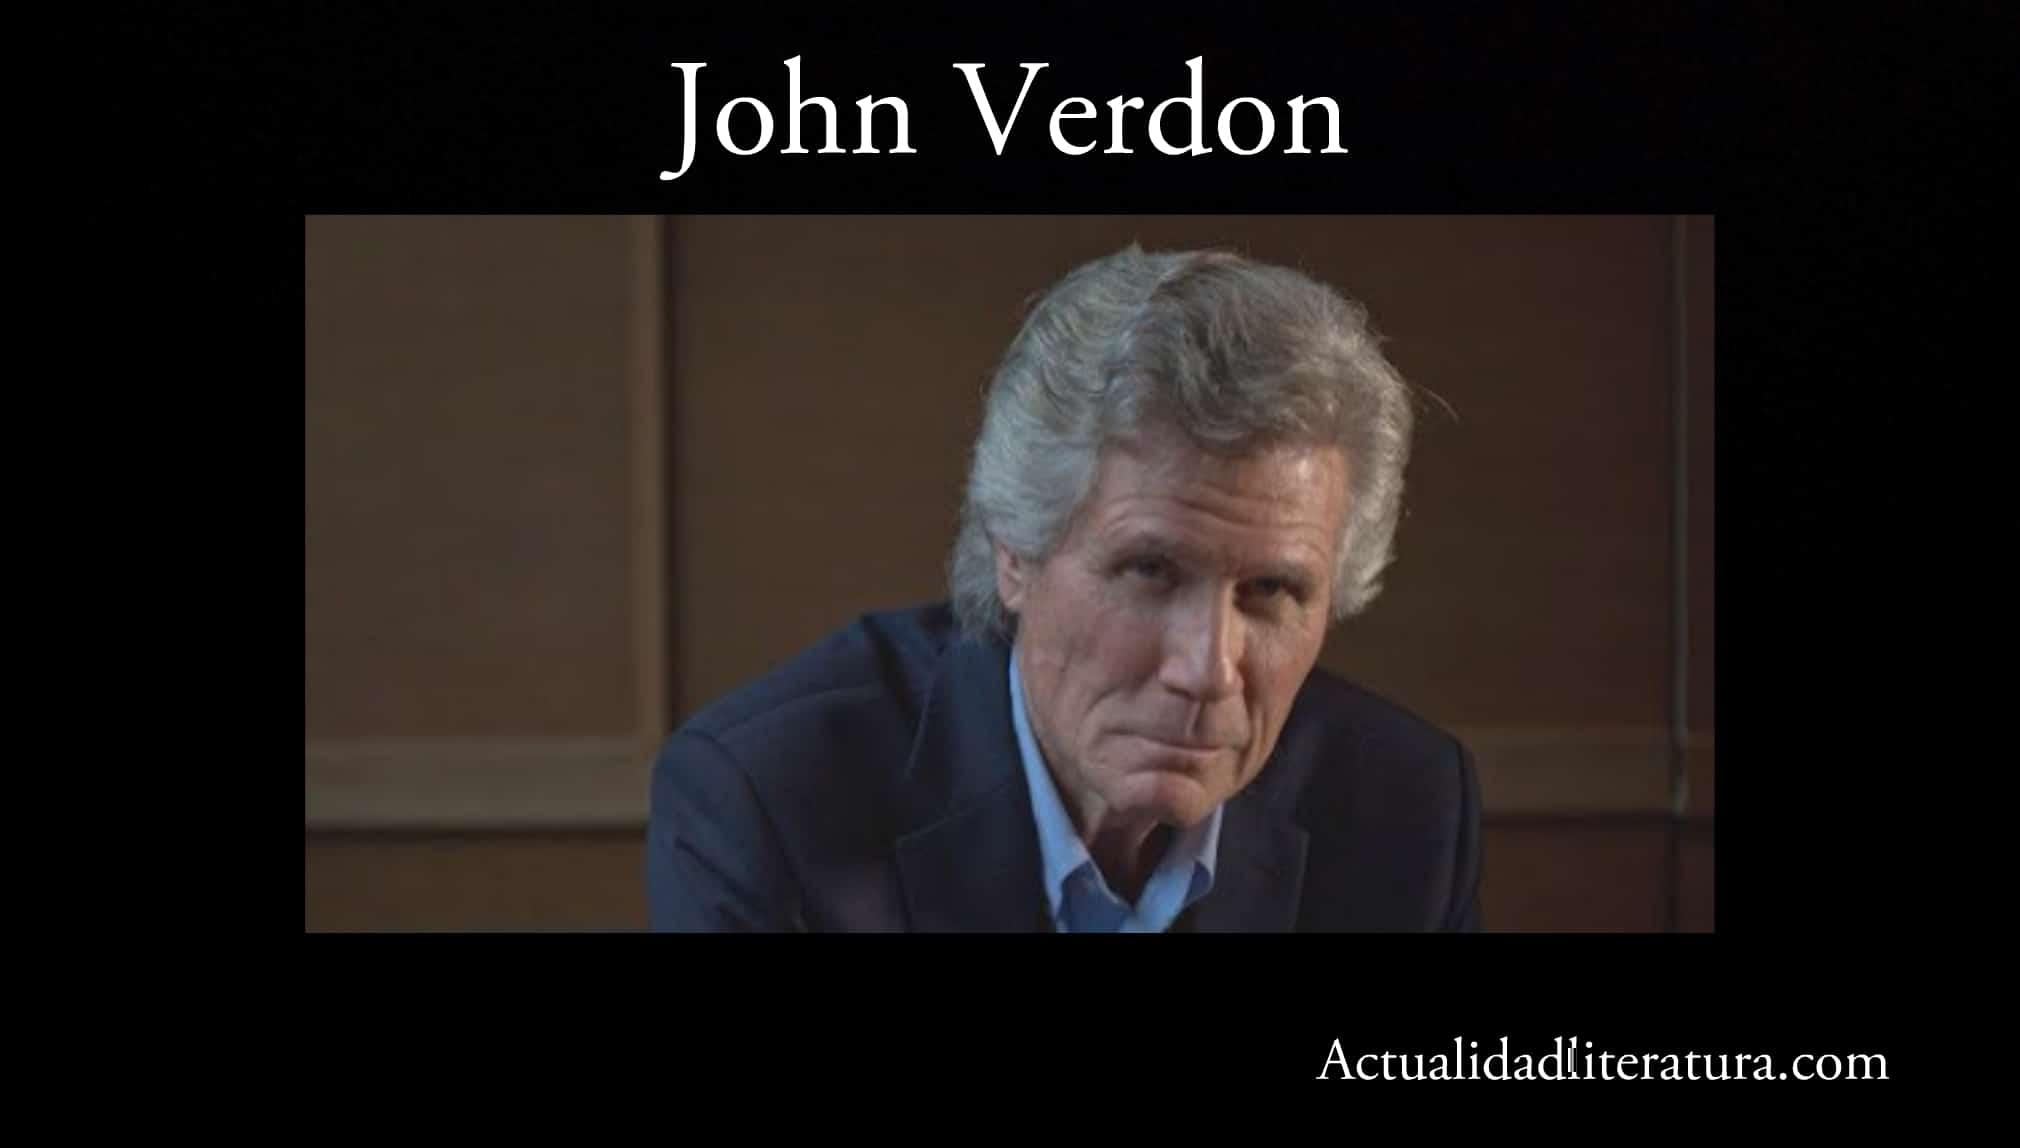 John Verdon.